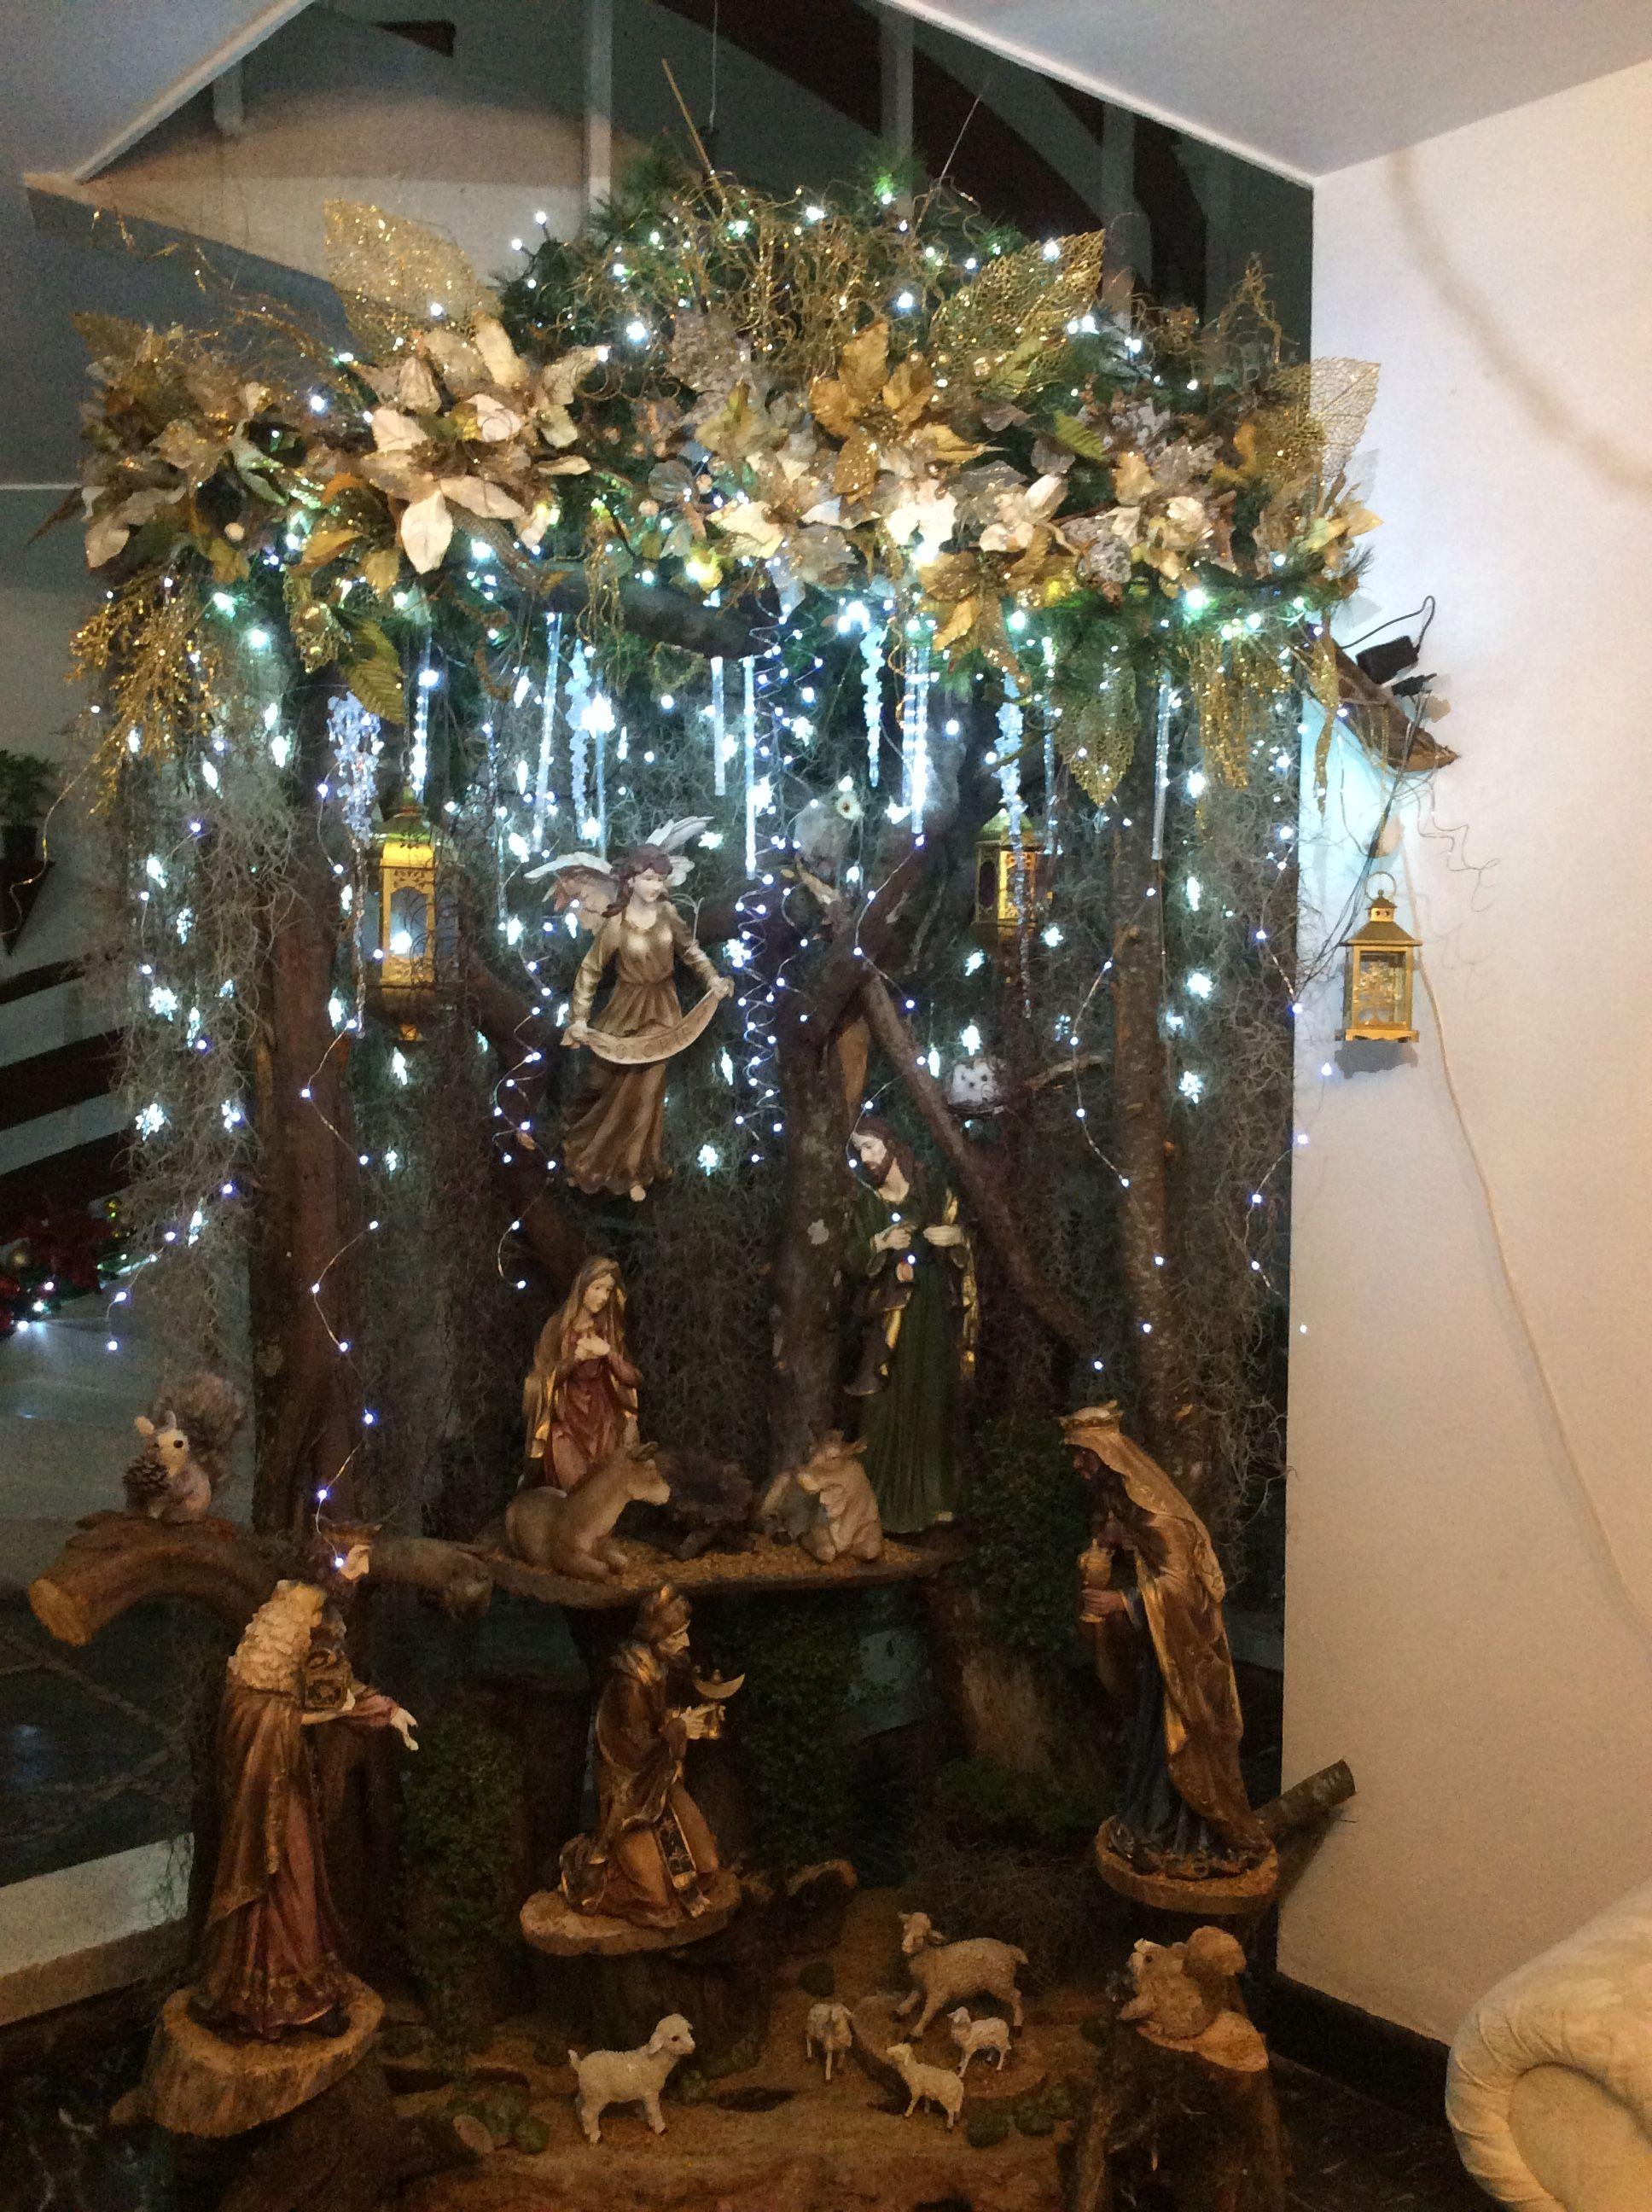 Mis Archivos Christmas Nativitymerry Christmaschristmas Craftschristmas Treesholiday Decorchristmas